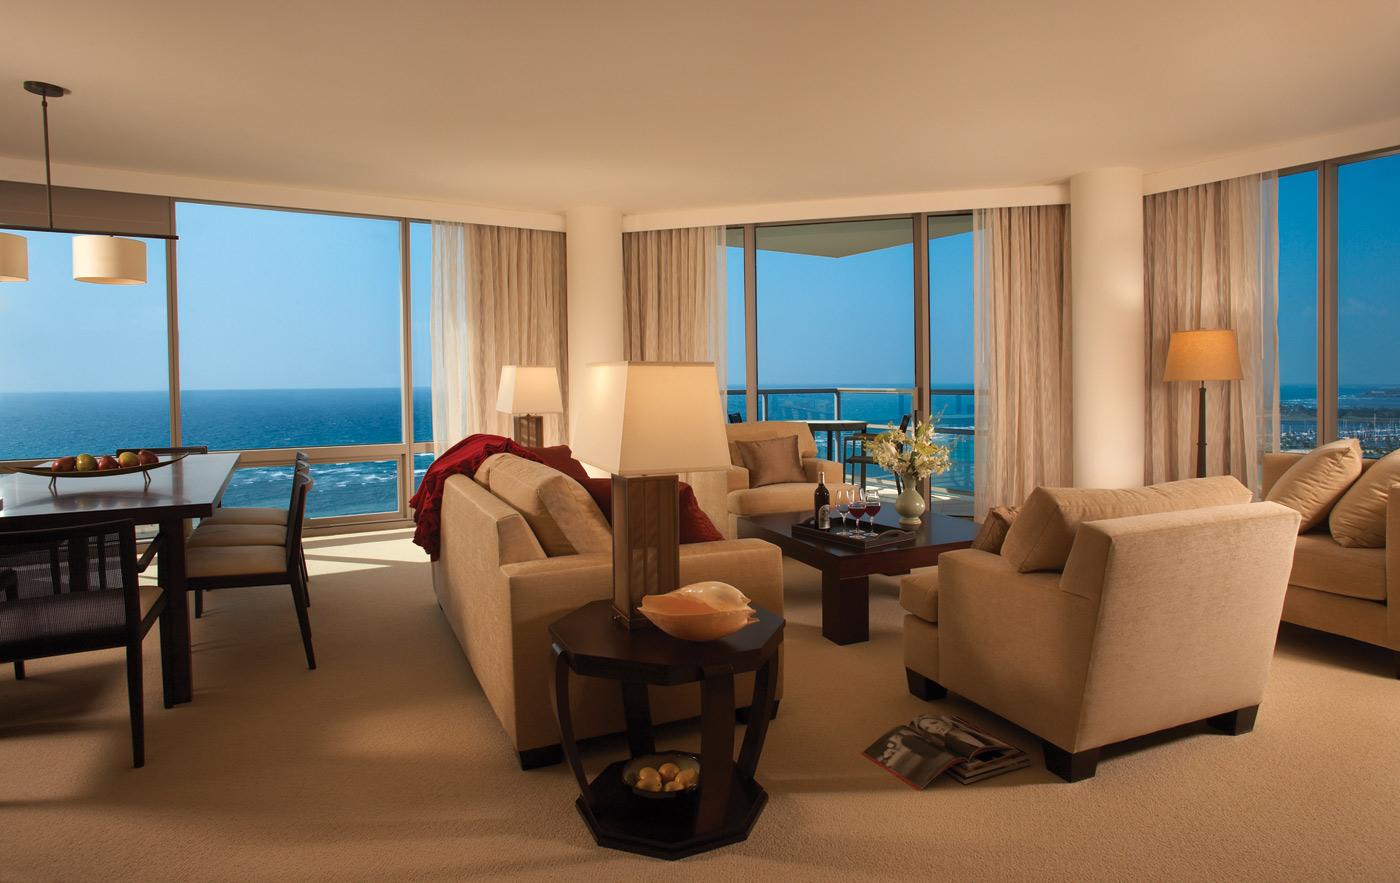 Trump international hotel waikiki beach walk honolulu hawaii - 2 bedroom suites honolulu hawaii ...